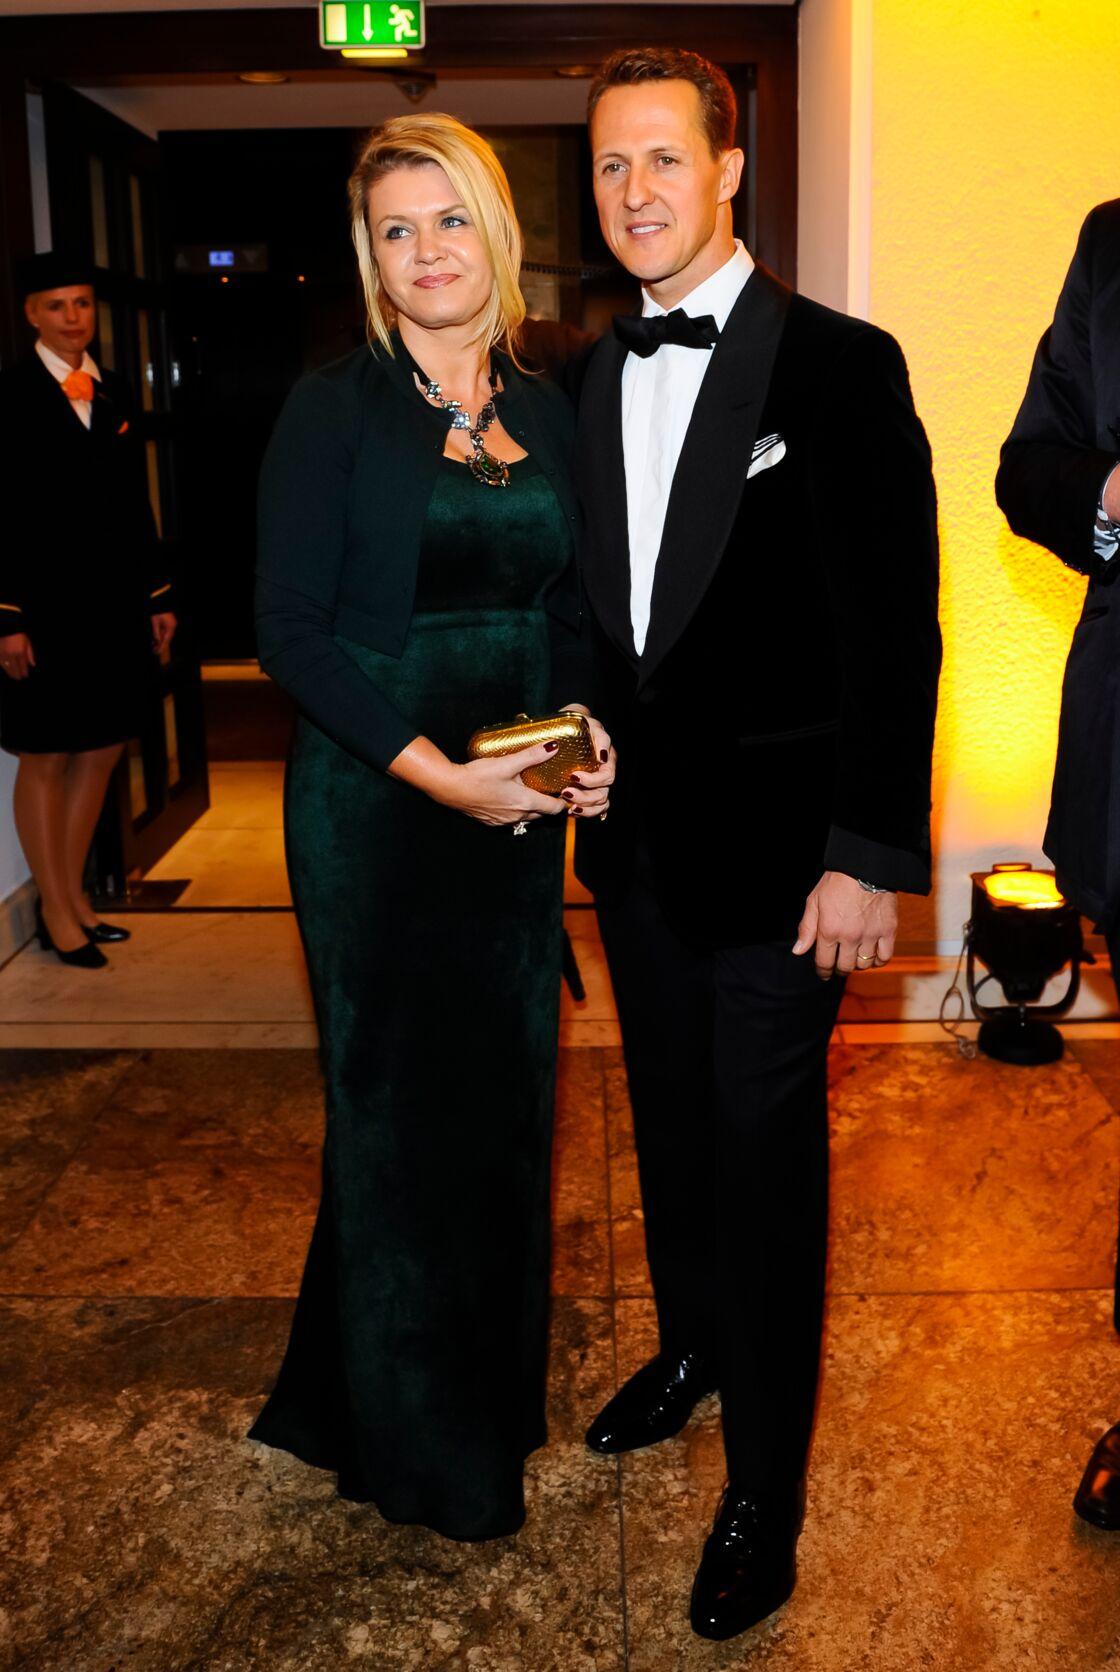 Corinna et Michael Schumacher en 2012